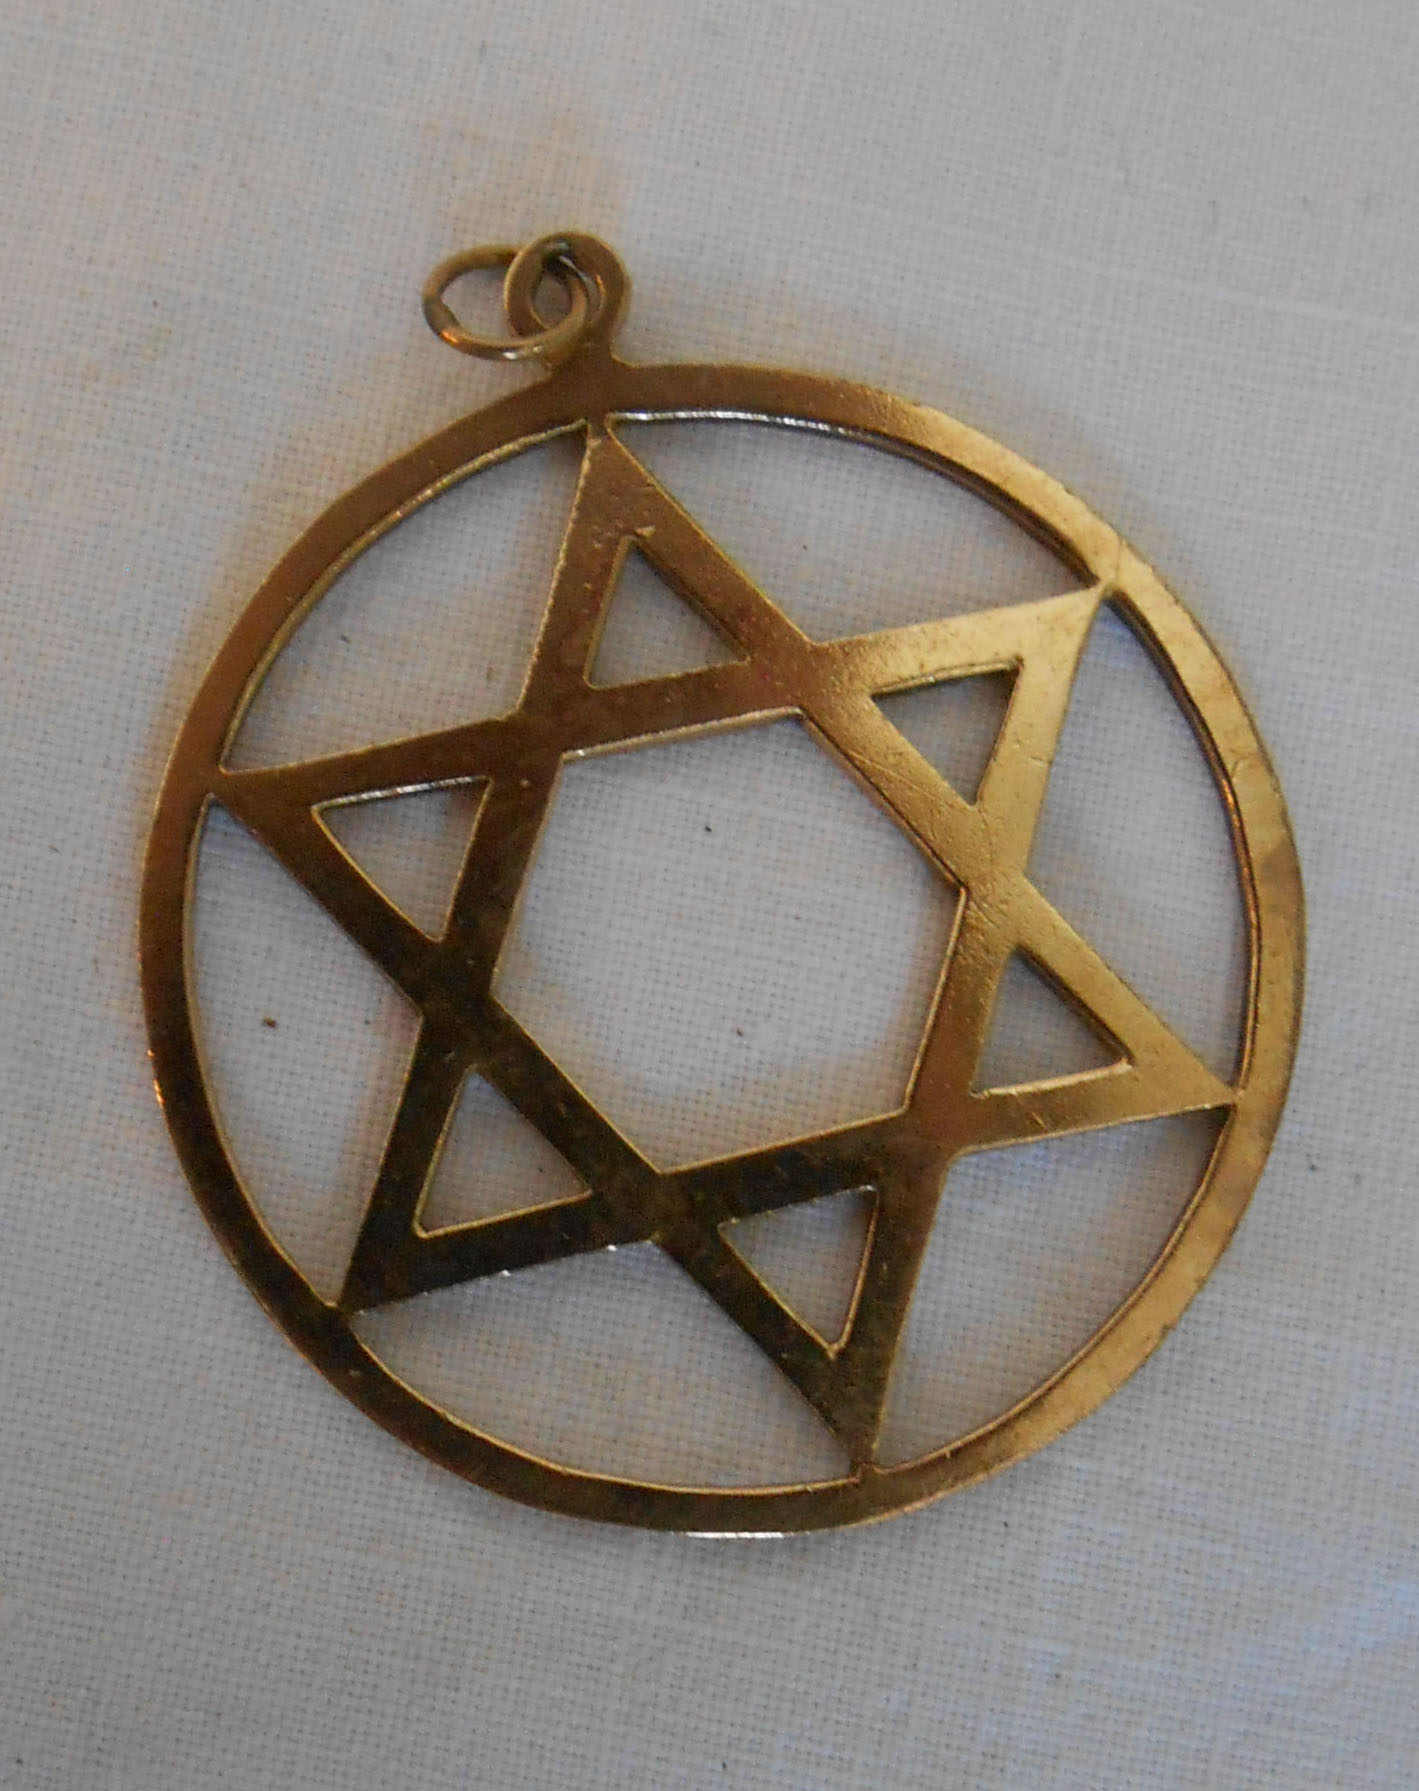 A hallmarked 9ct. gold star of David pendant